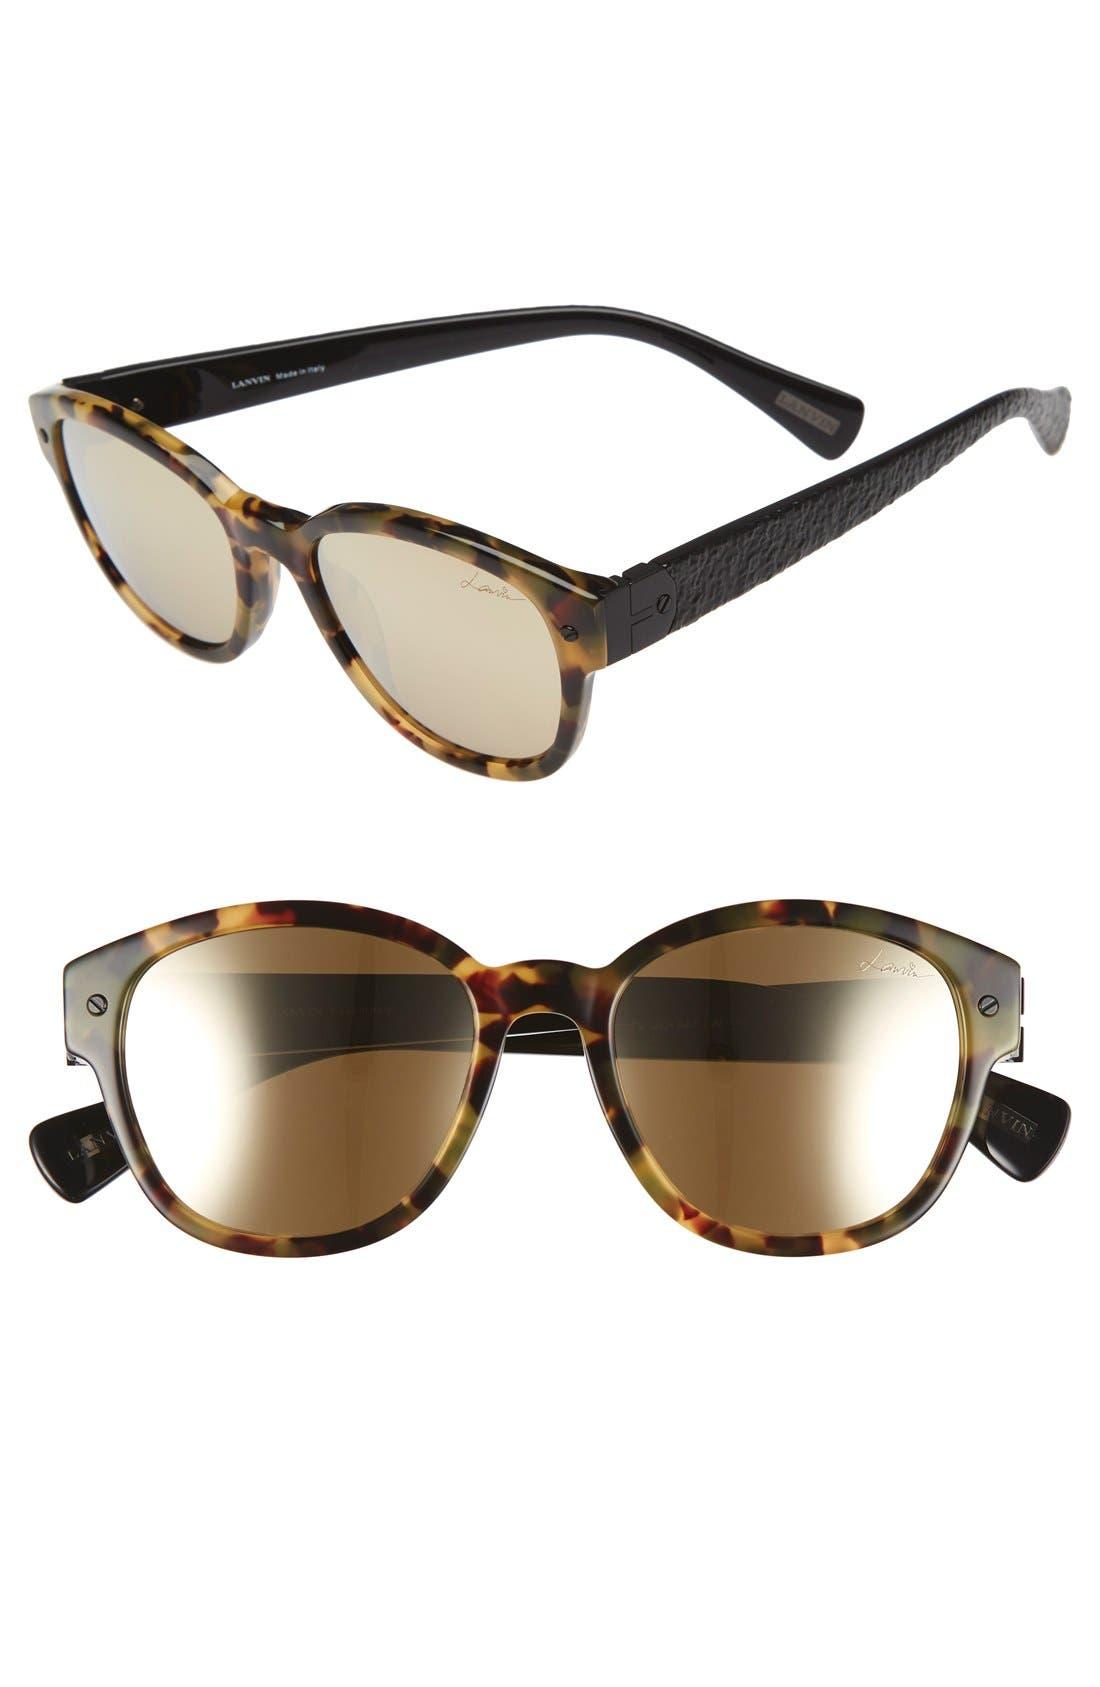 50mm Retro Sunglasses,                         Main,                         color, Light Havana